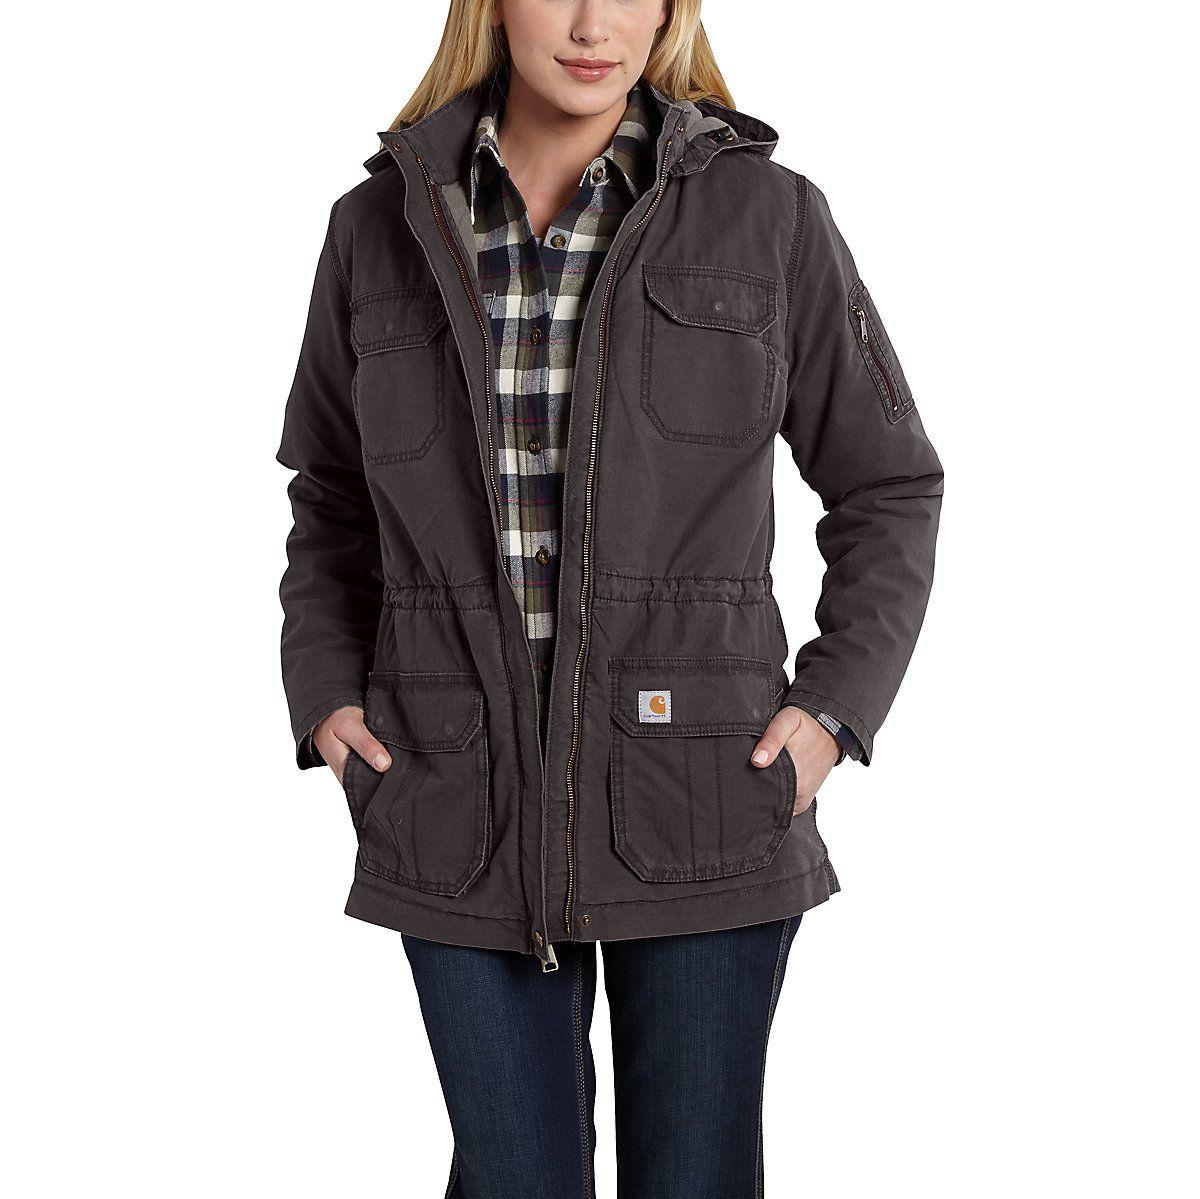 Gallatin Coat Carhartt Jacket Jackets Outerwear [ 1199 x 1200 Pixel ]